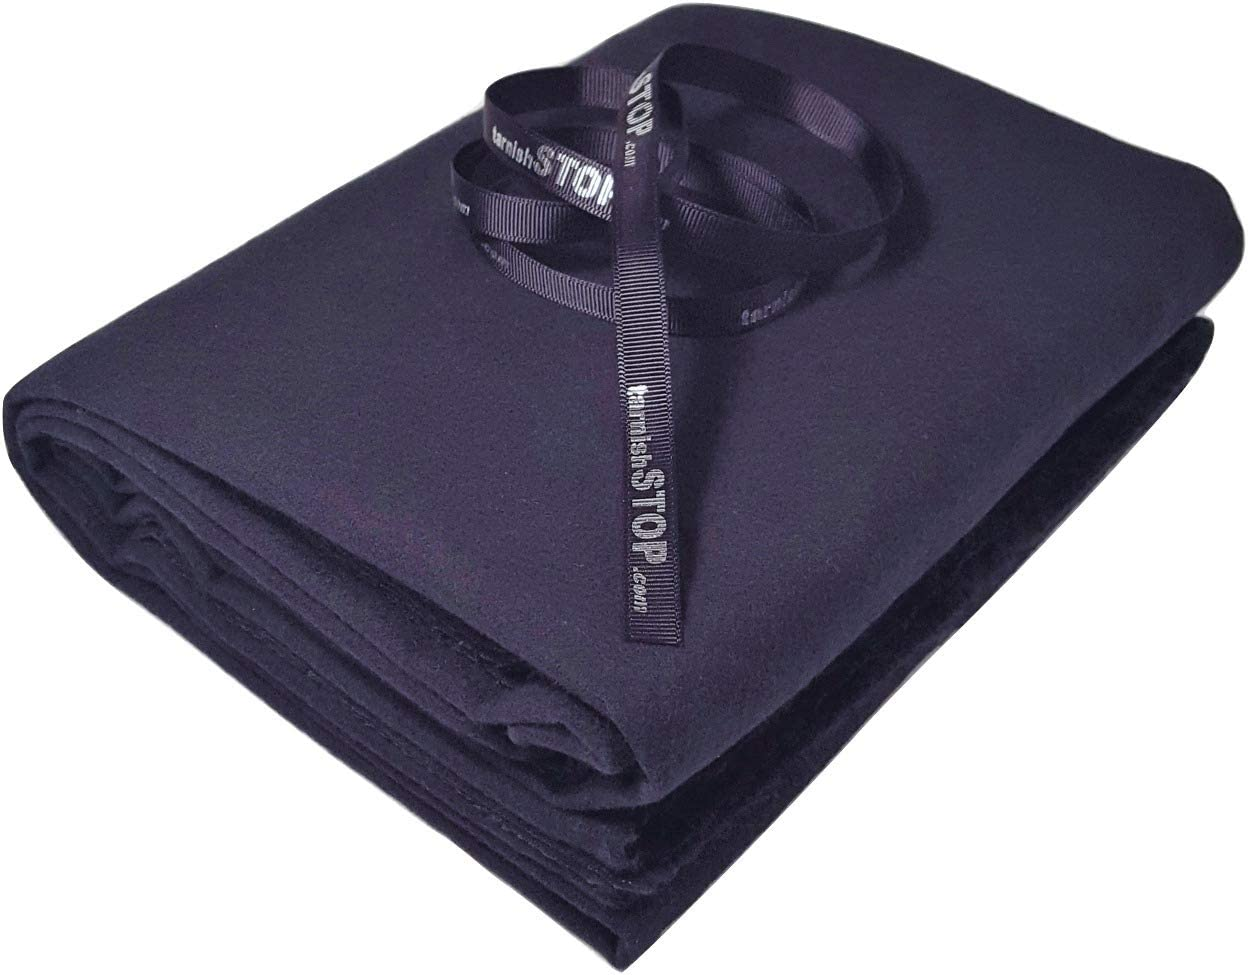 tarnishSTOP Luxury Anti-Tarnish Philadelphia Mall Prevention Cloth Silver Fabric Super popular specialty store